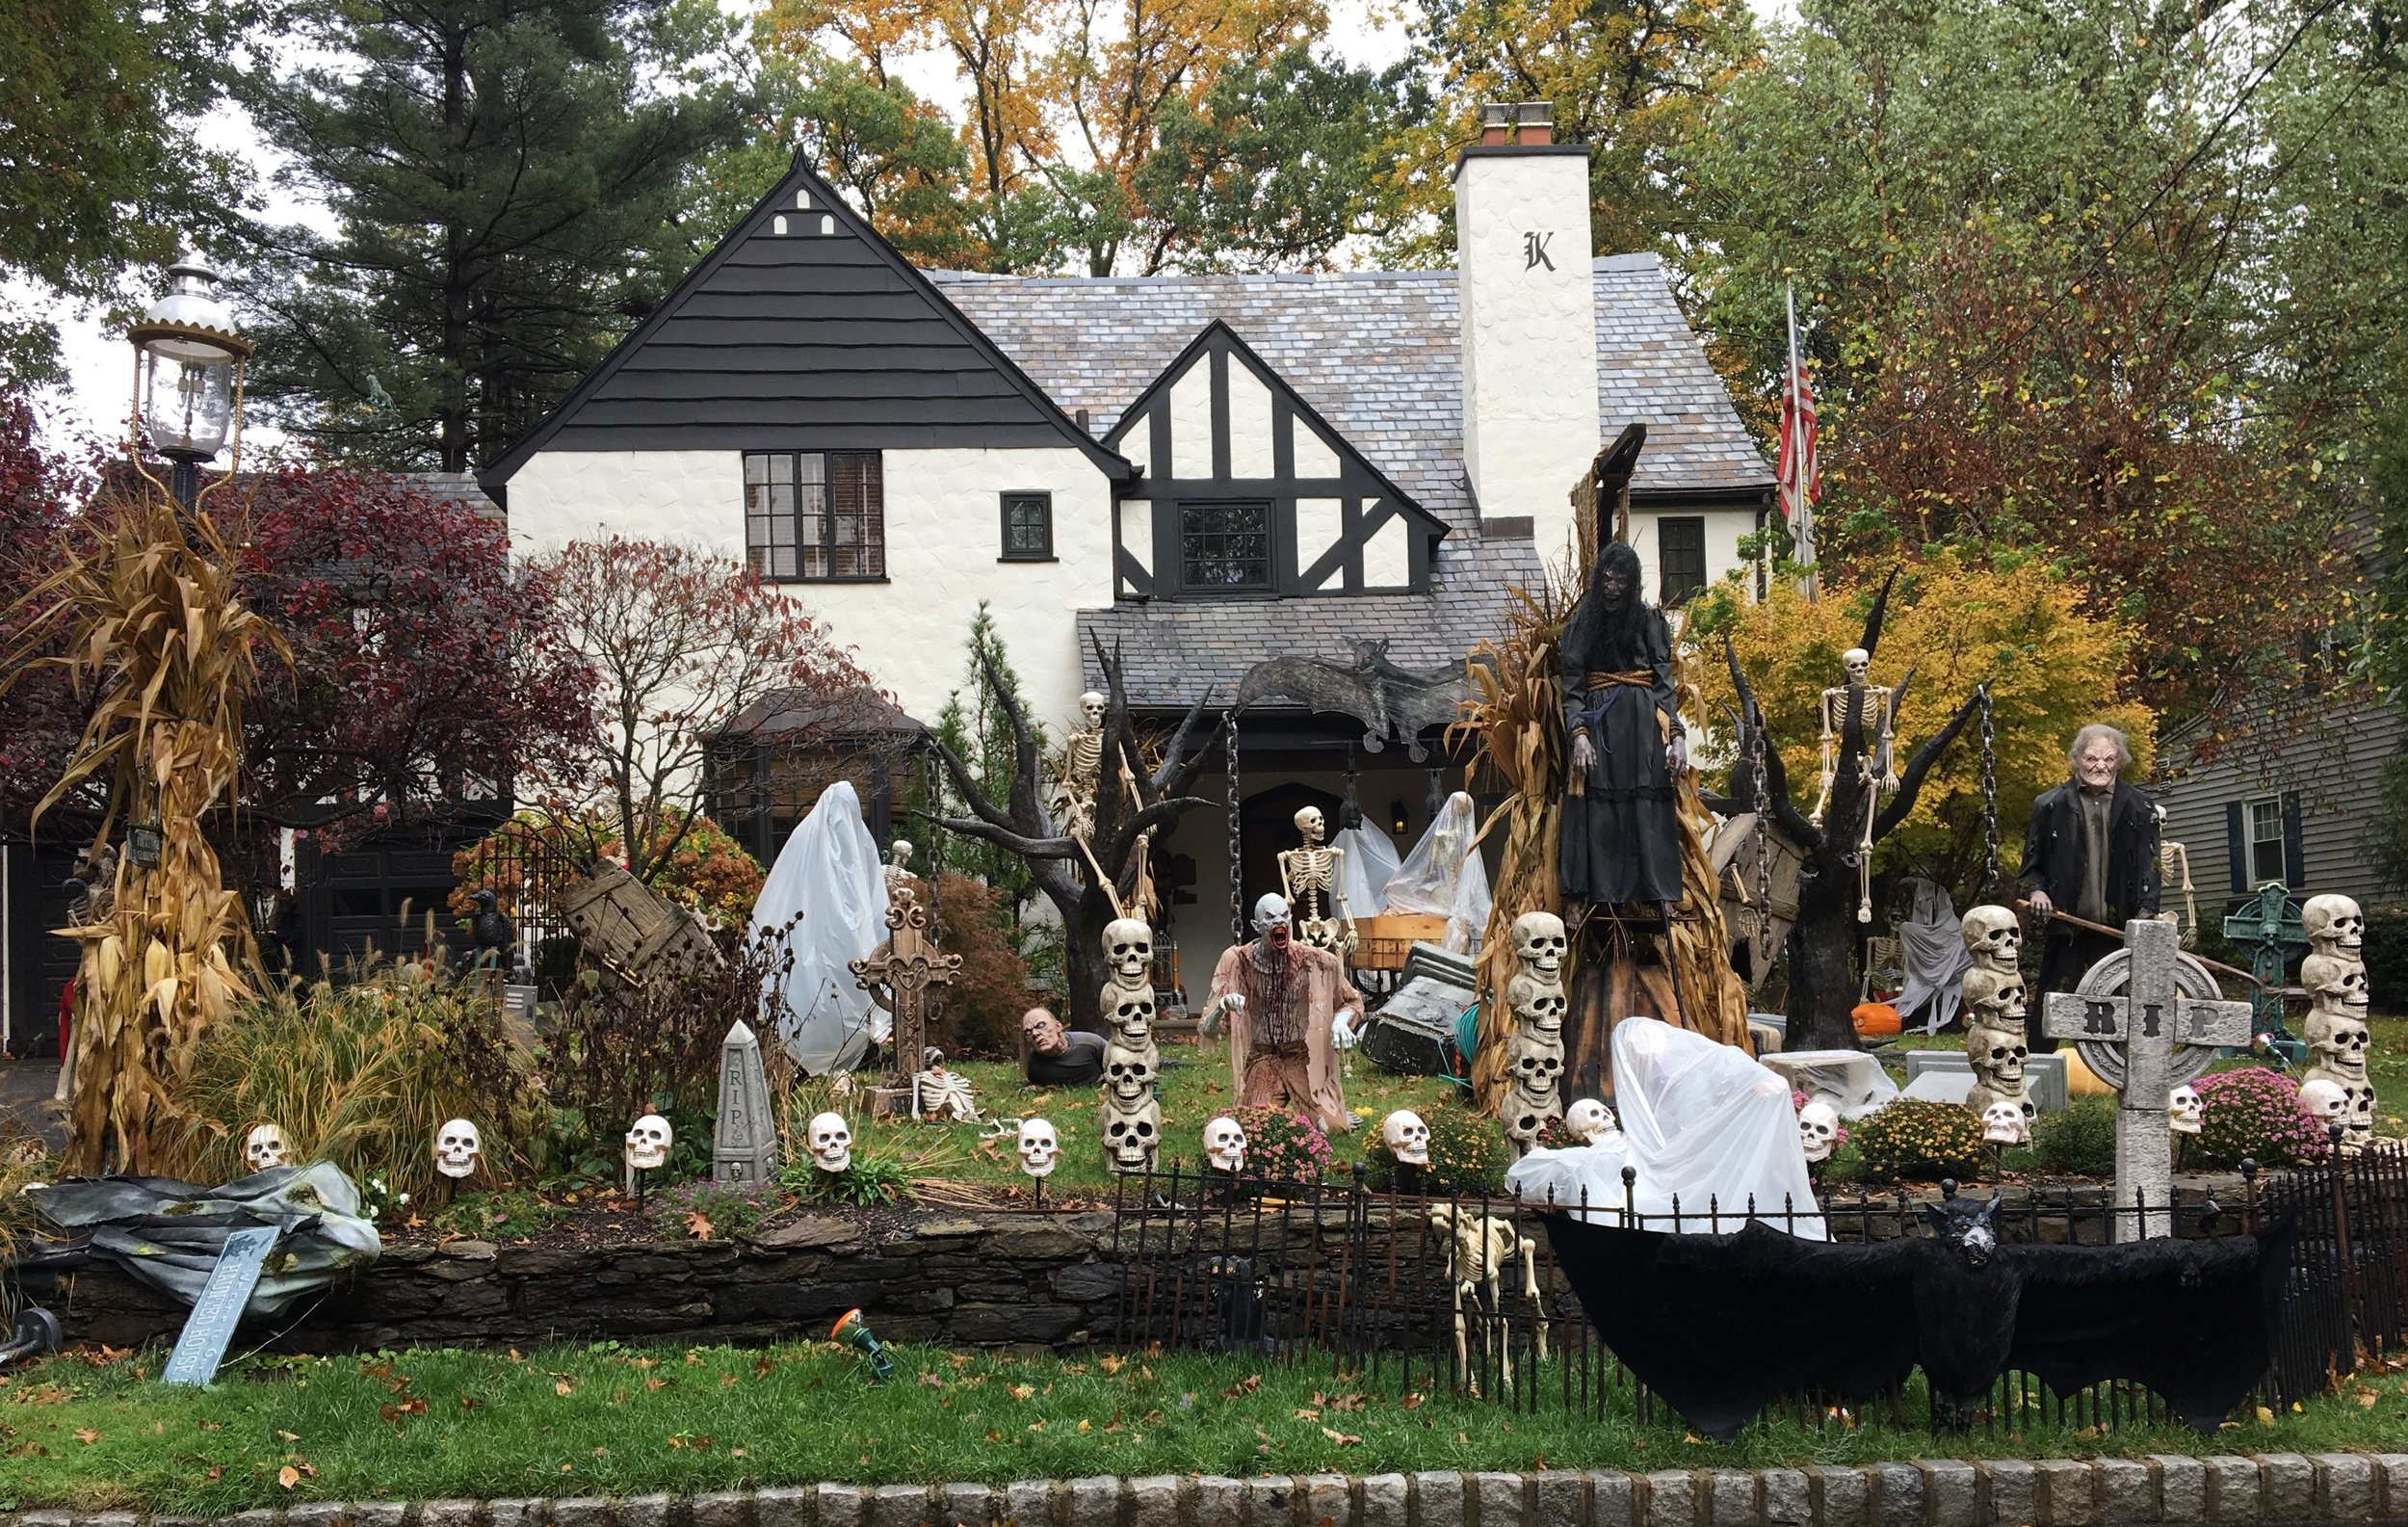 The Halloween House 2017!